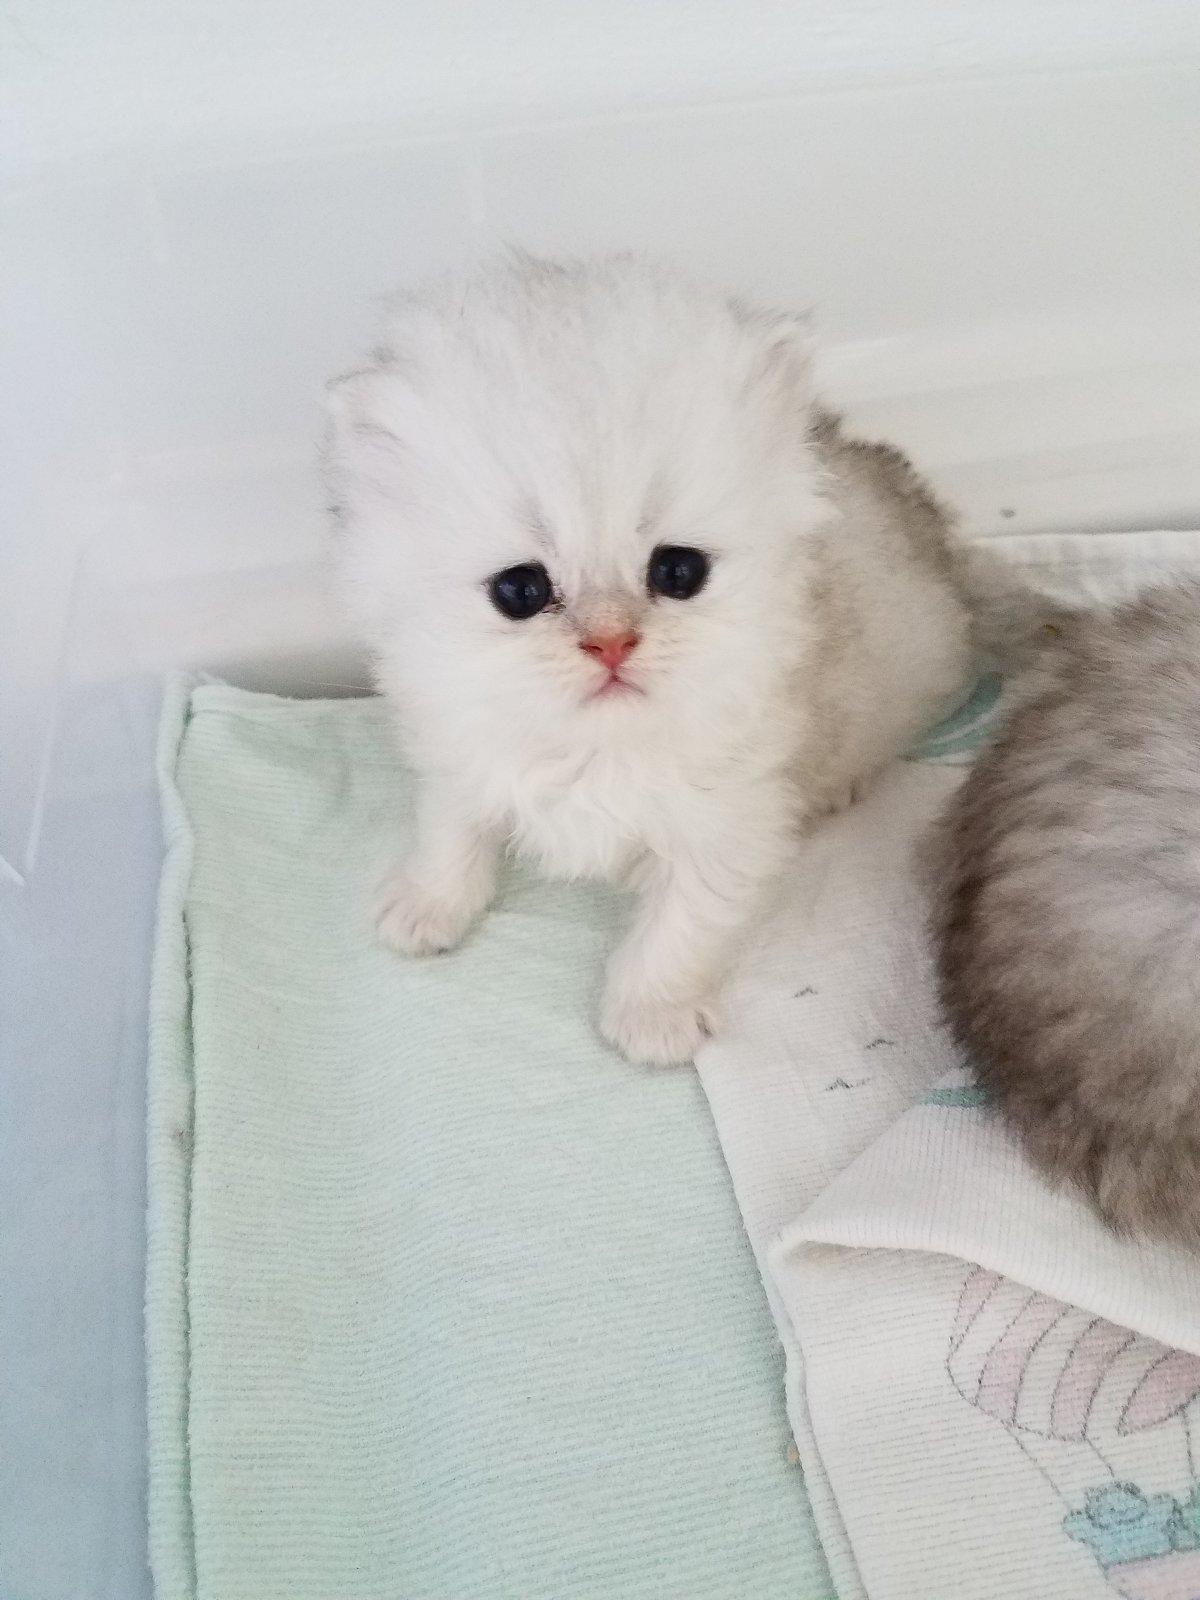 Sneak Peak into The Nursery Doll Face Persian KittensUltra Rare